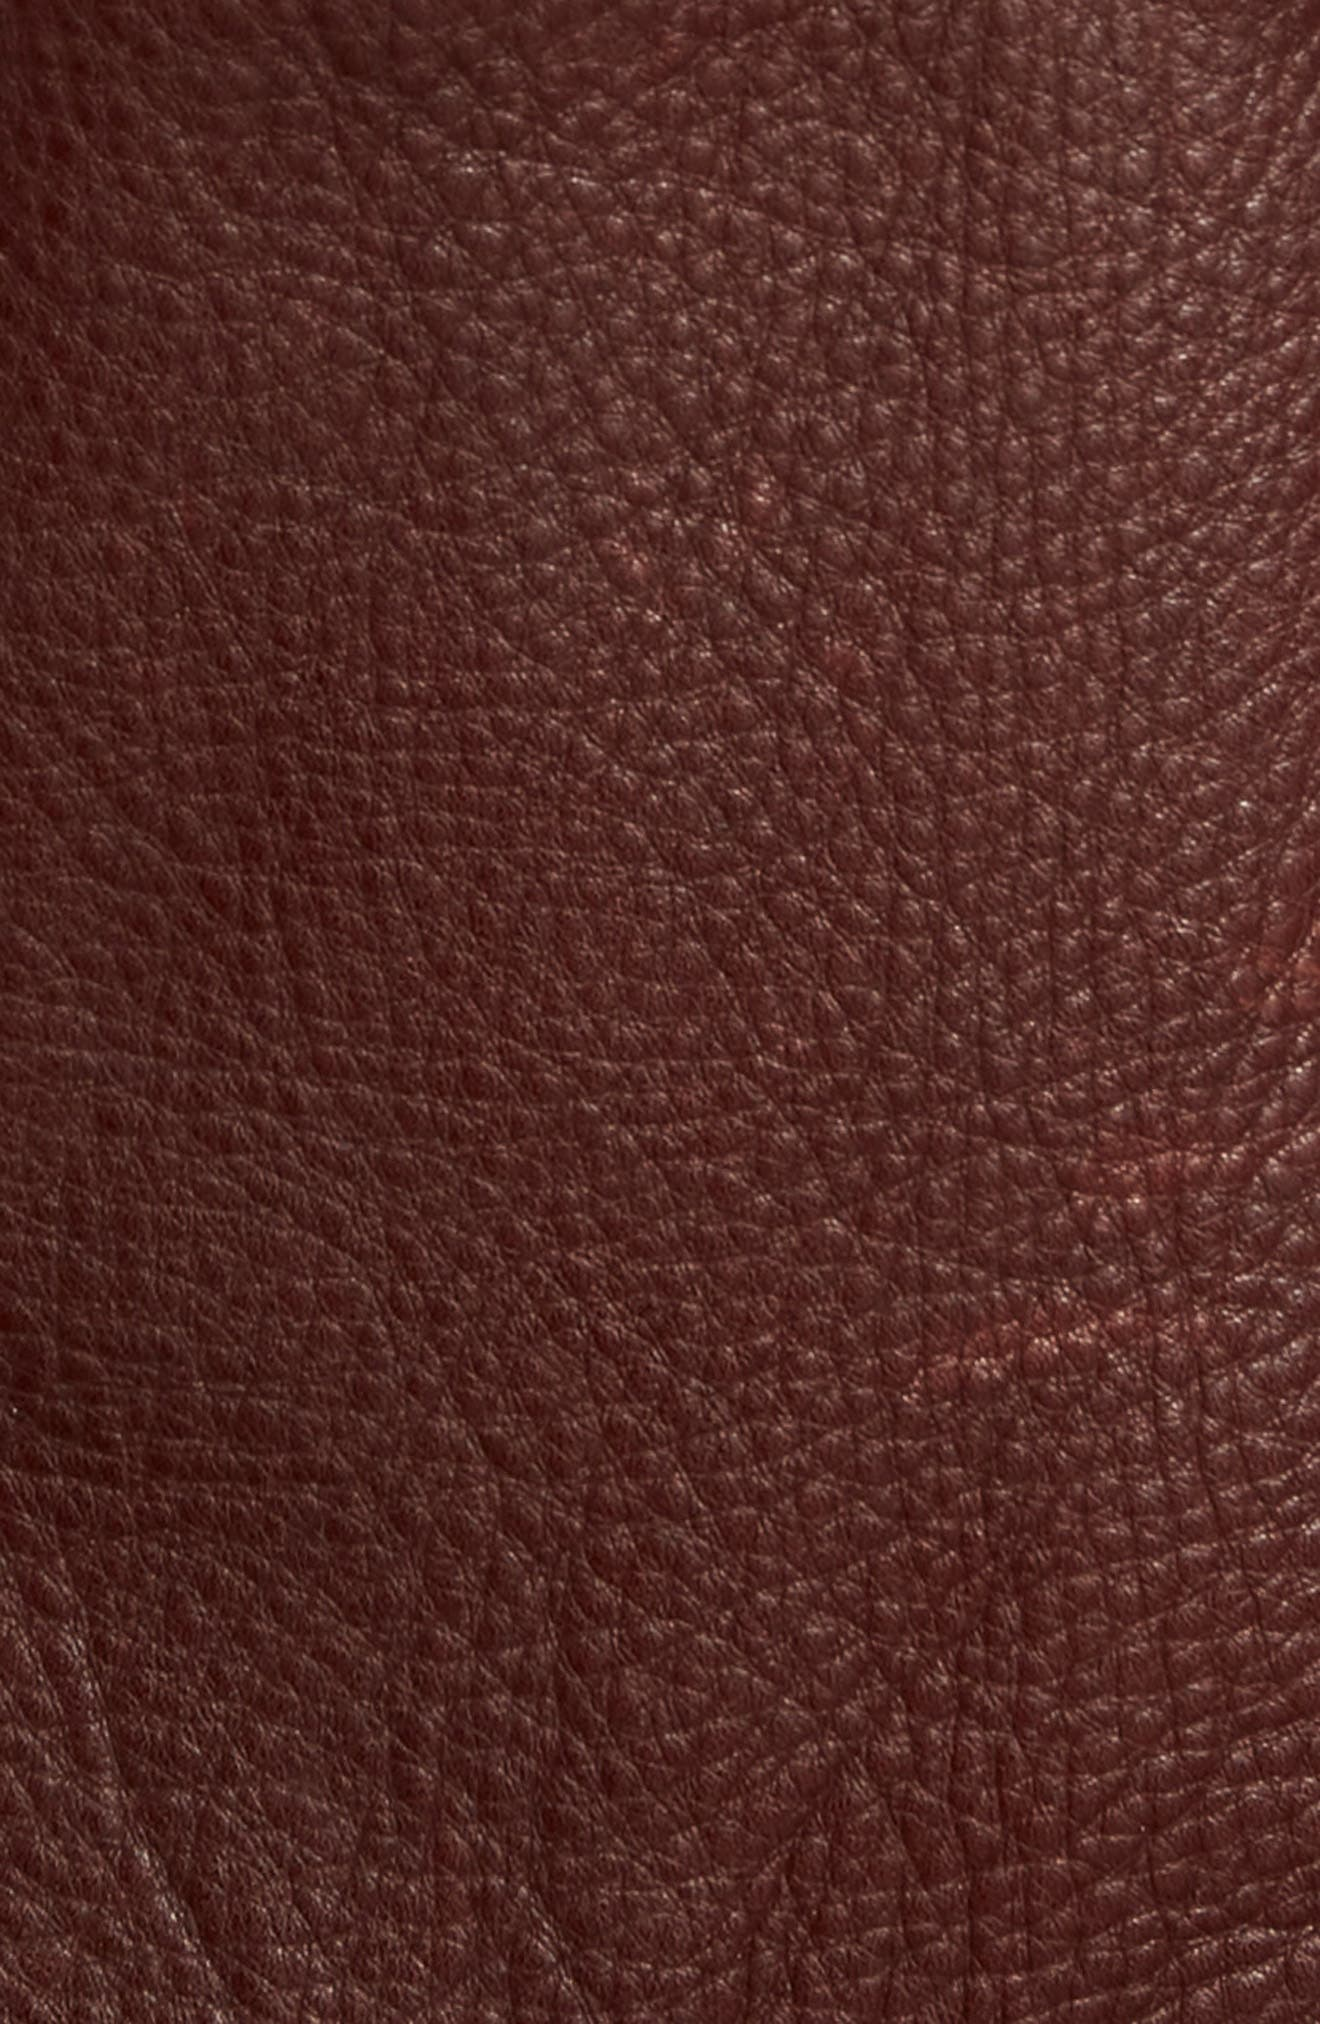 Leather Moto Jacket,                             Alternate thumbnail 6, color,                             DARK CHESTNUT